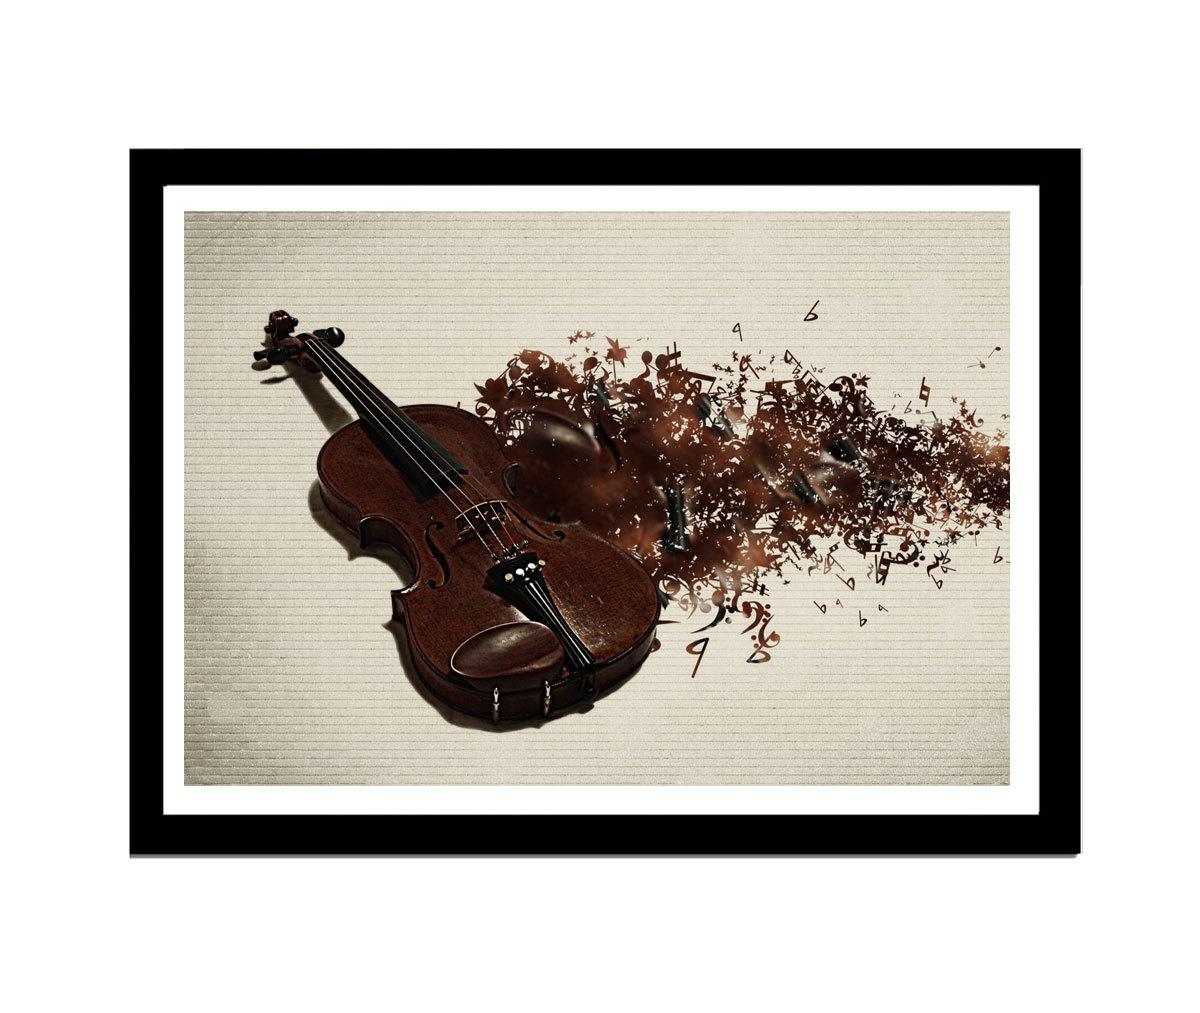 Quadro MDF violino 33x25cm Moldura Preto